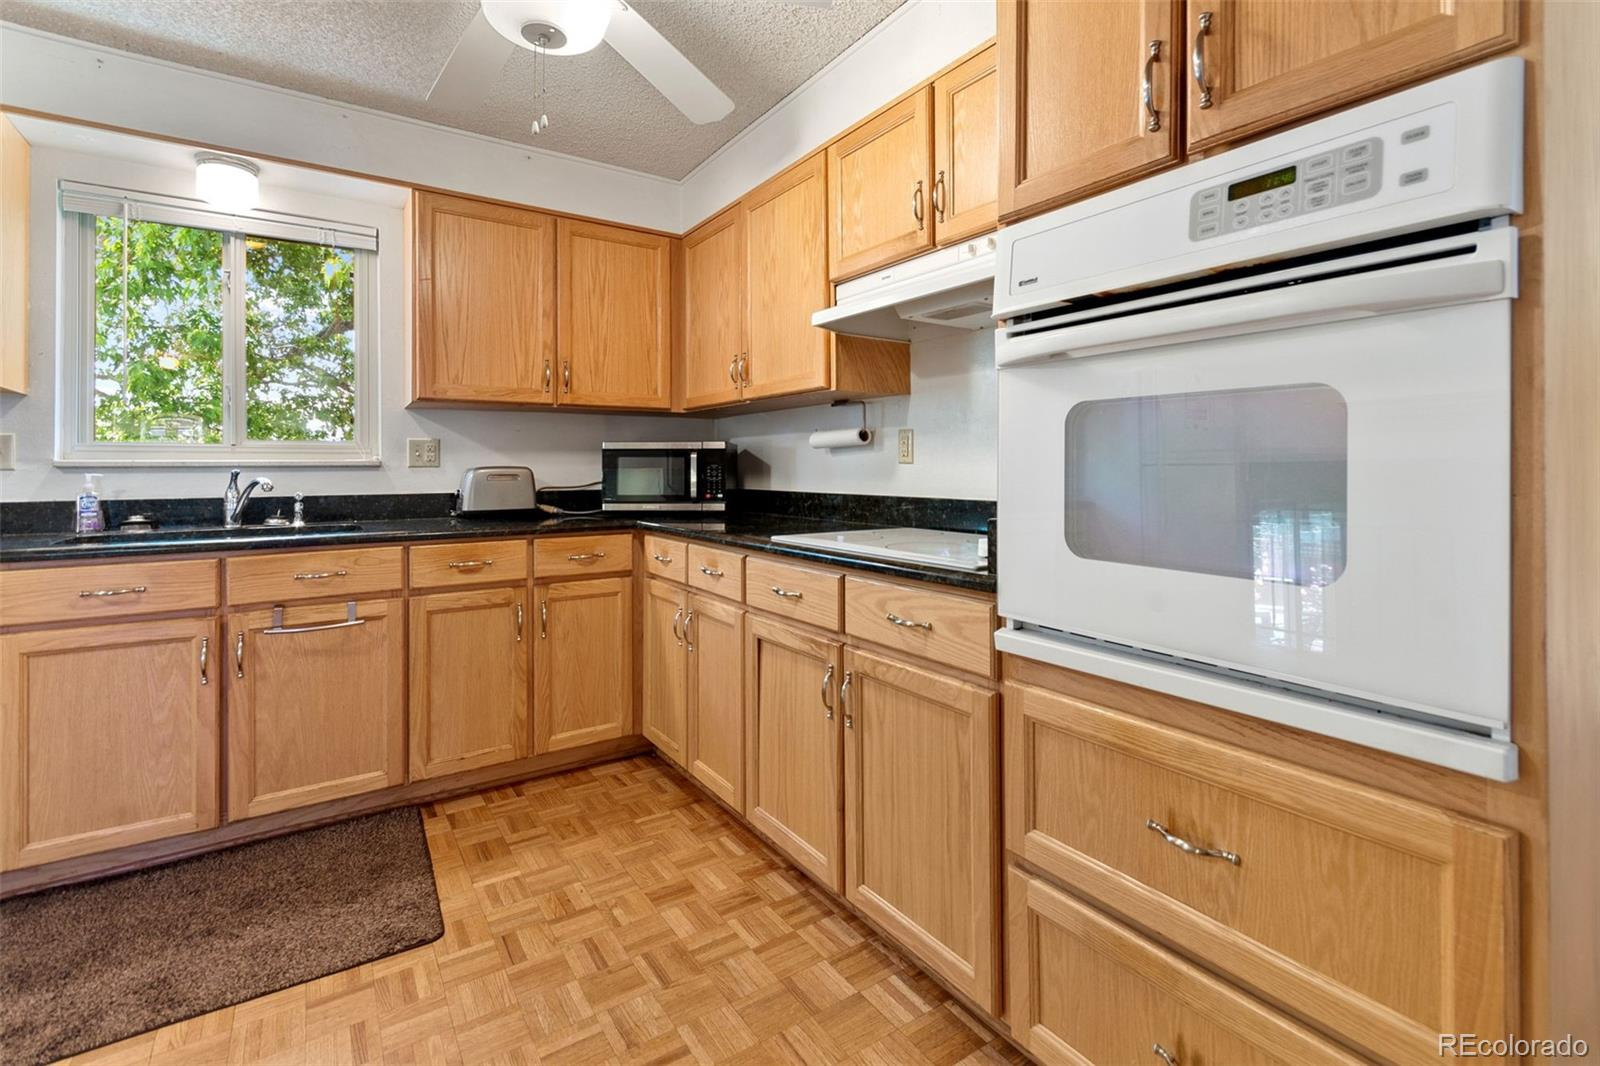 MLS# 7770404 - 12 - 2355 S Hoyt Street, Lakewood, CO 80227